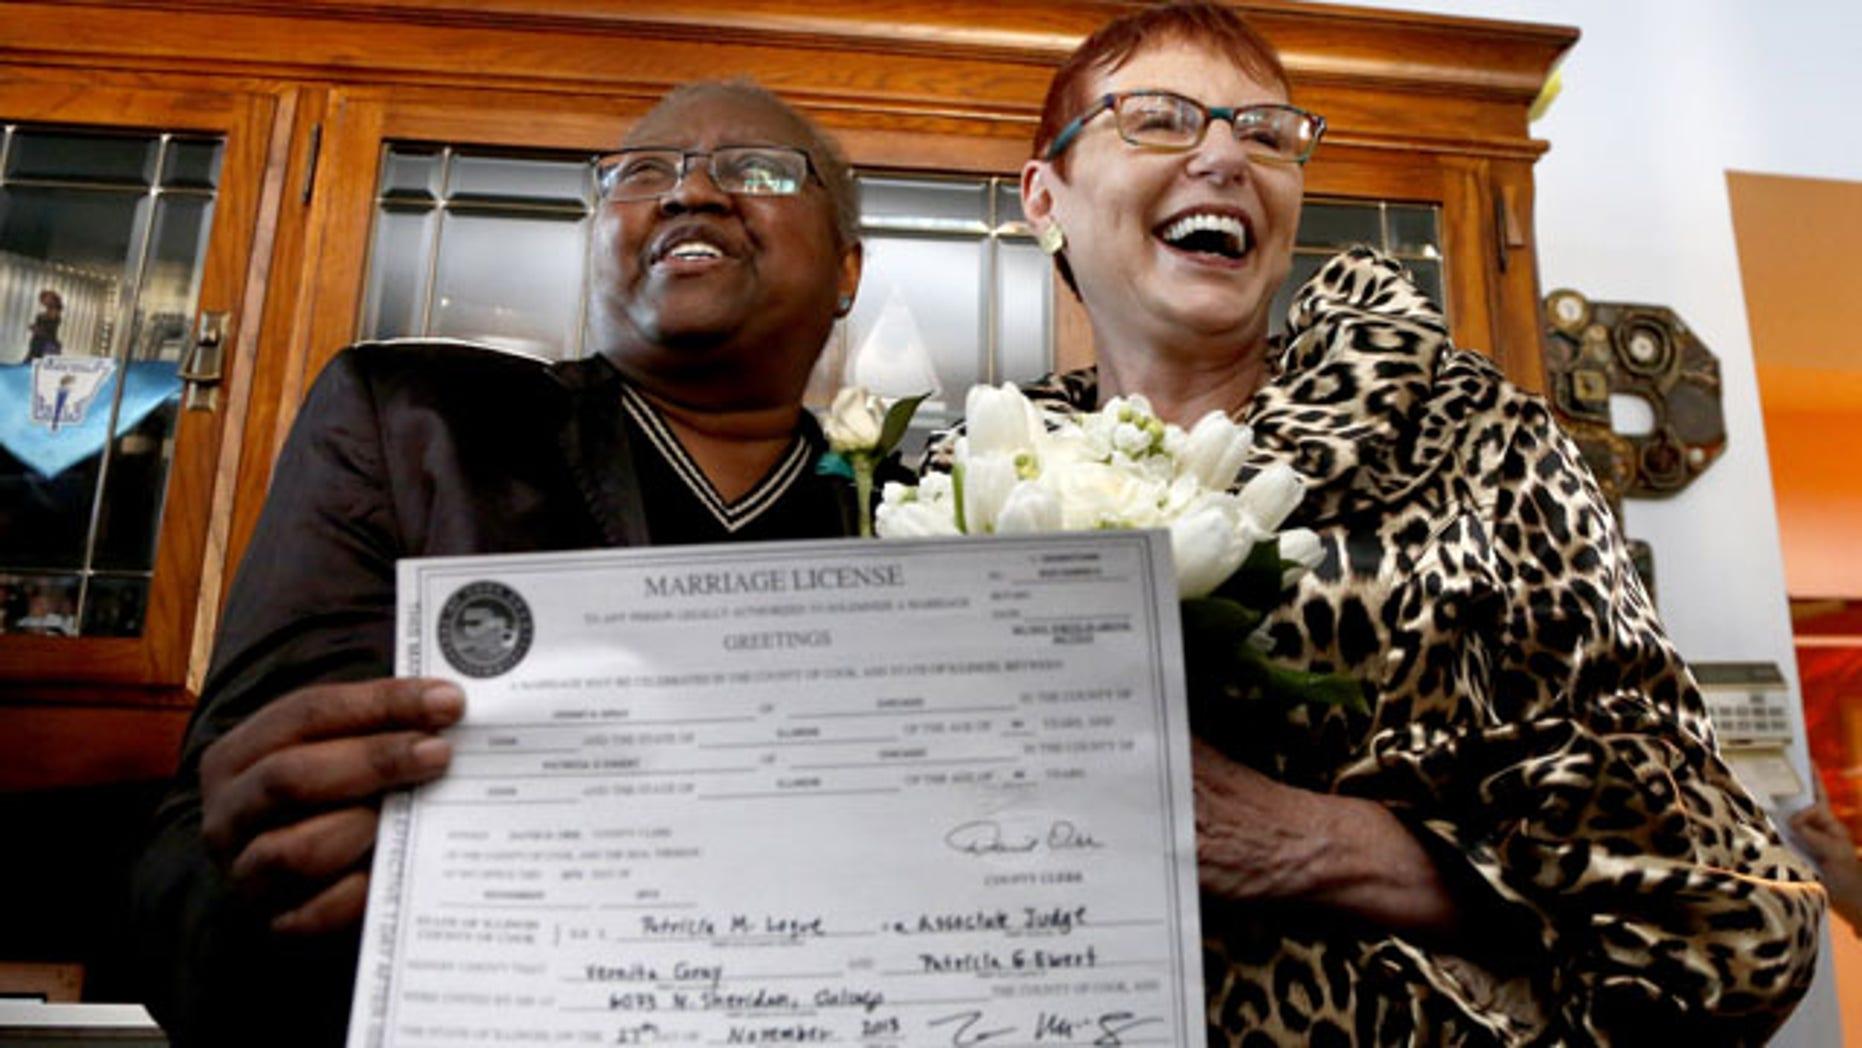 Same sex marriage in illinois Nude Photos 55